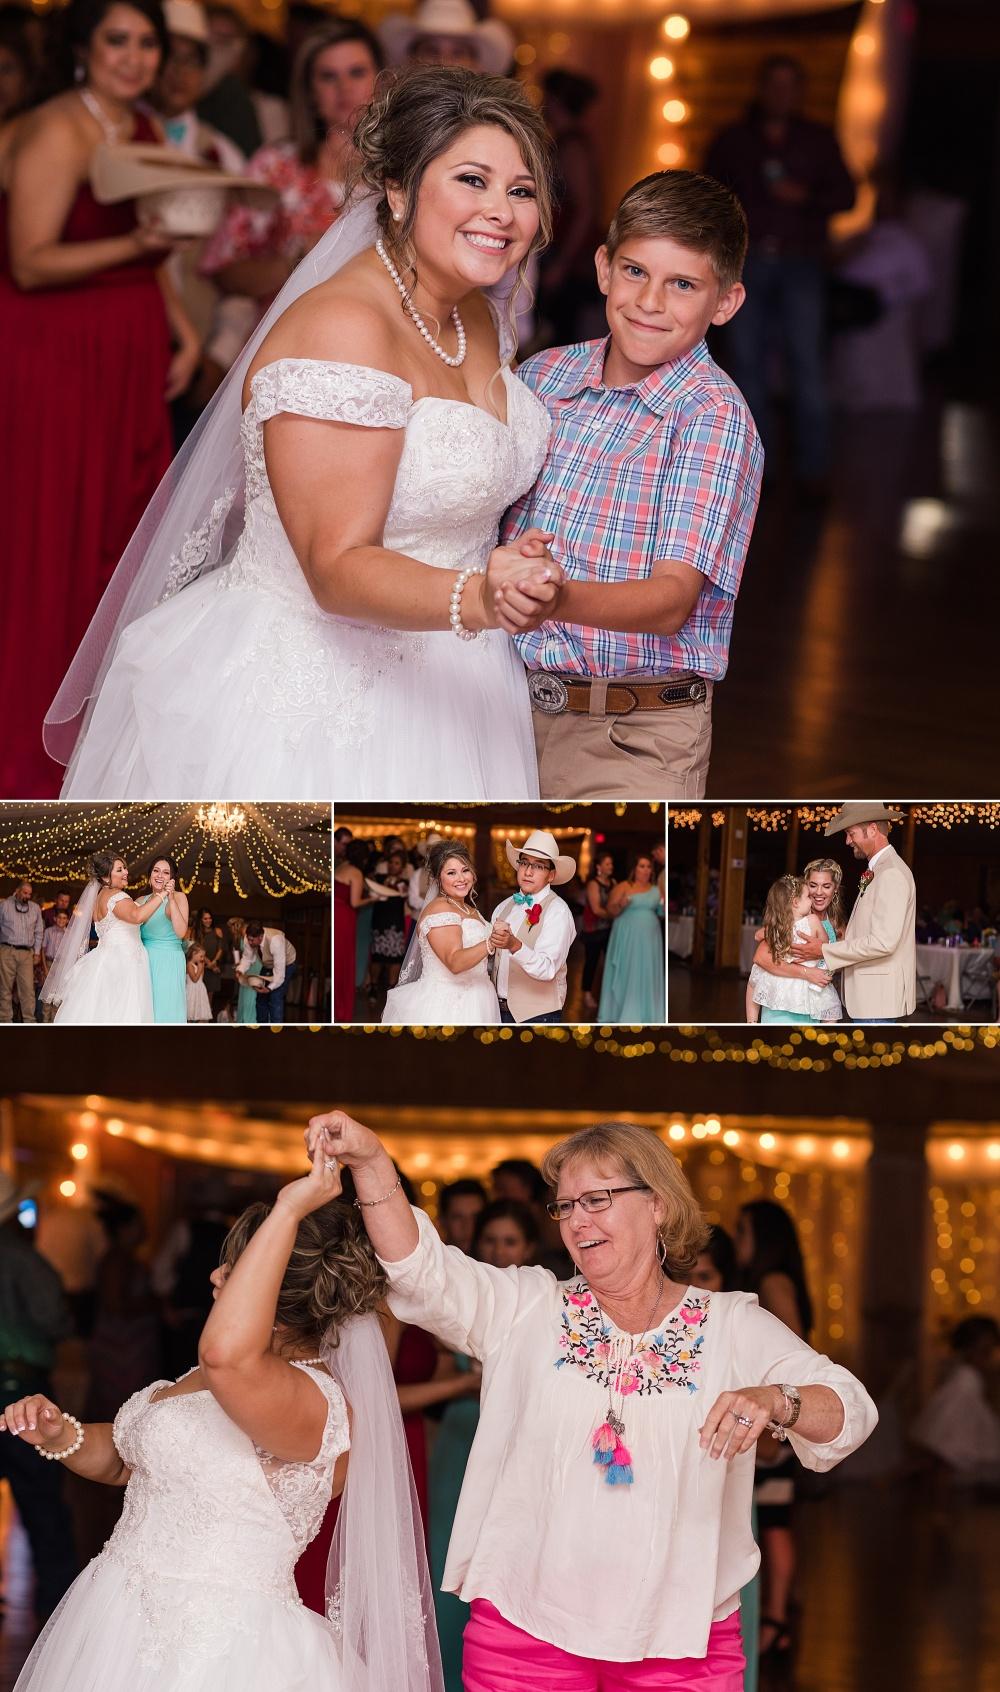 Bride,Carly Barton Photography,Eagle Dancer Ranch,Texas,Wedding,ceremony,groom,reception,